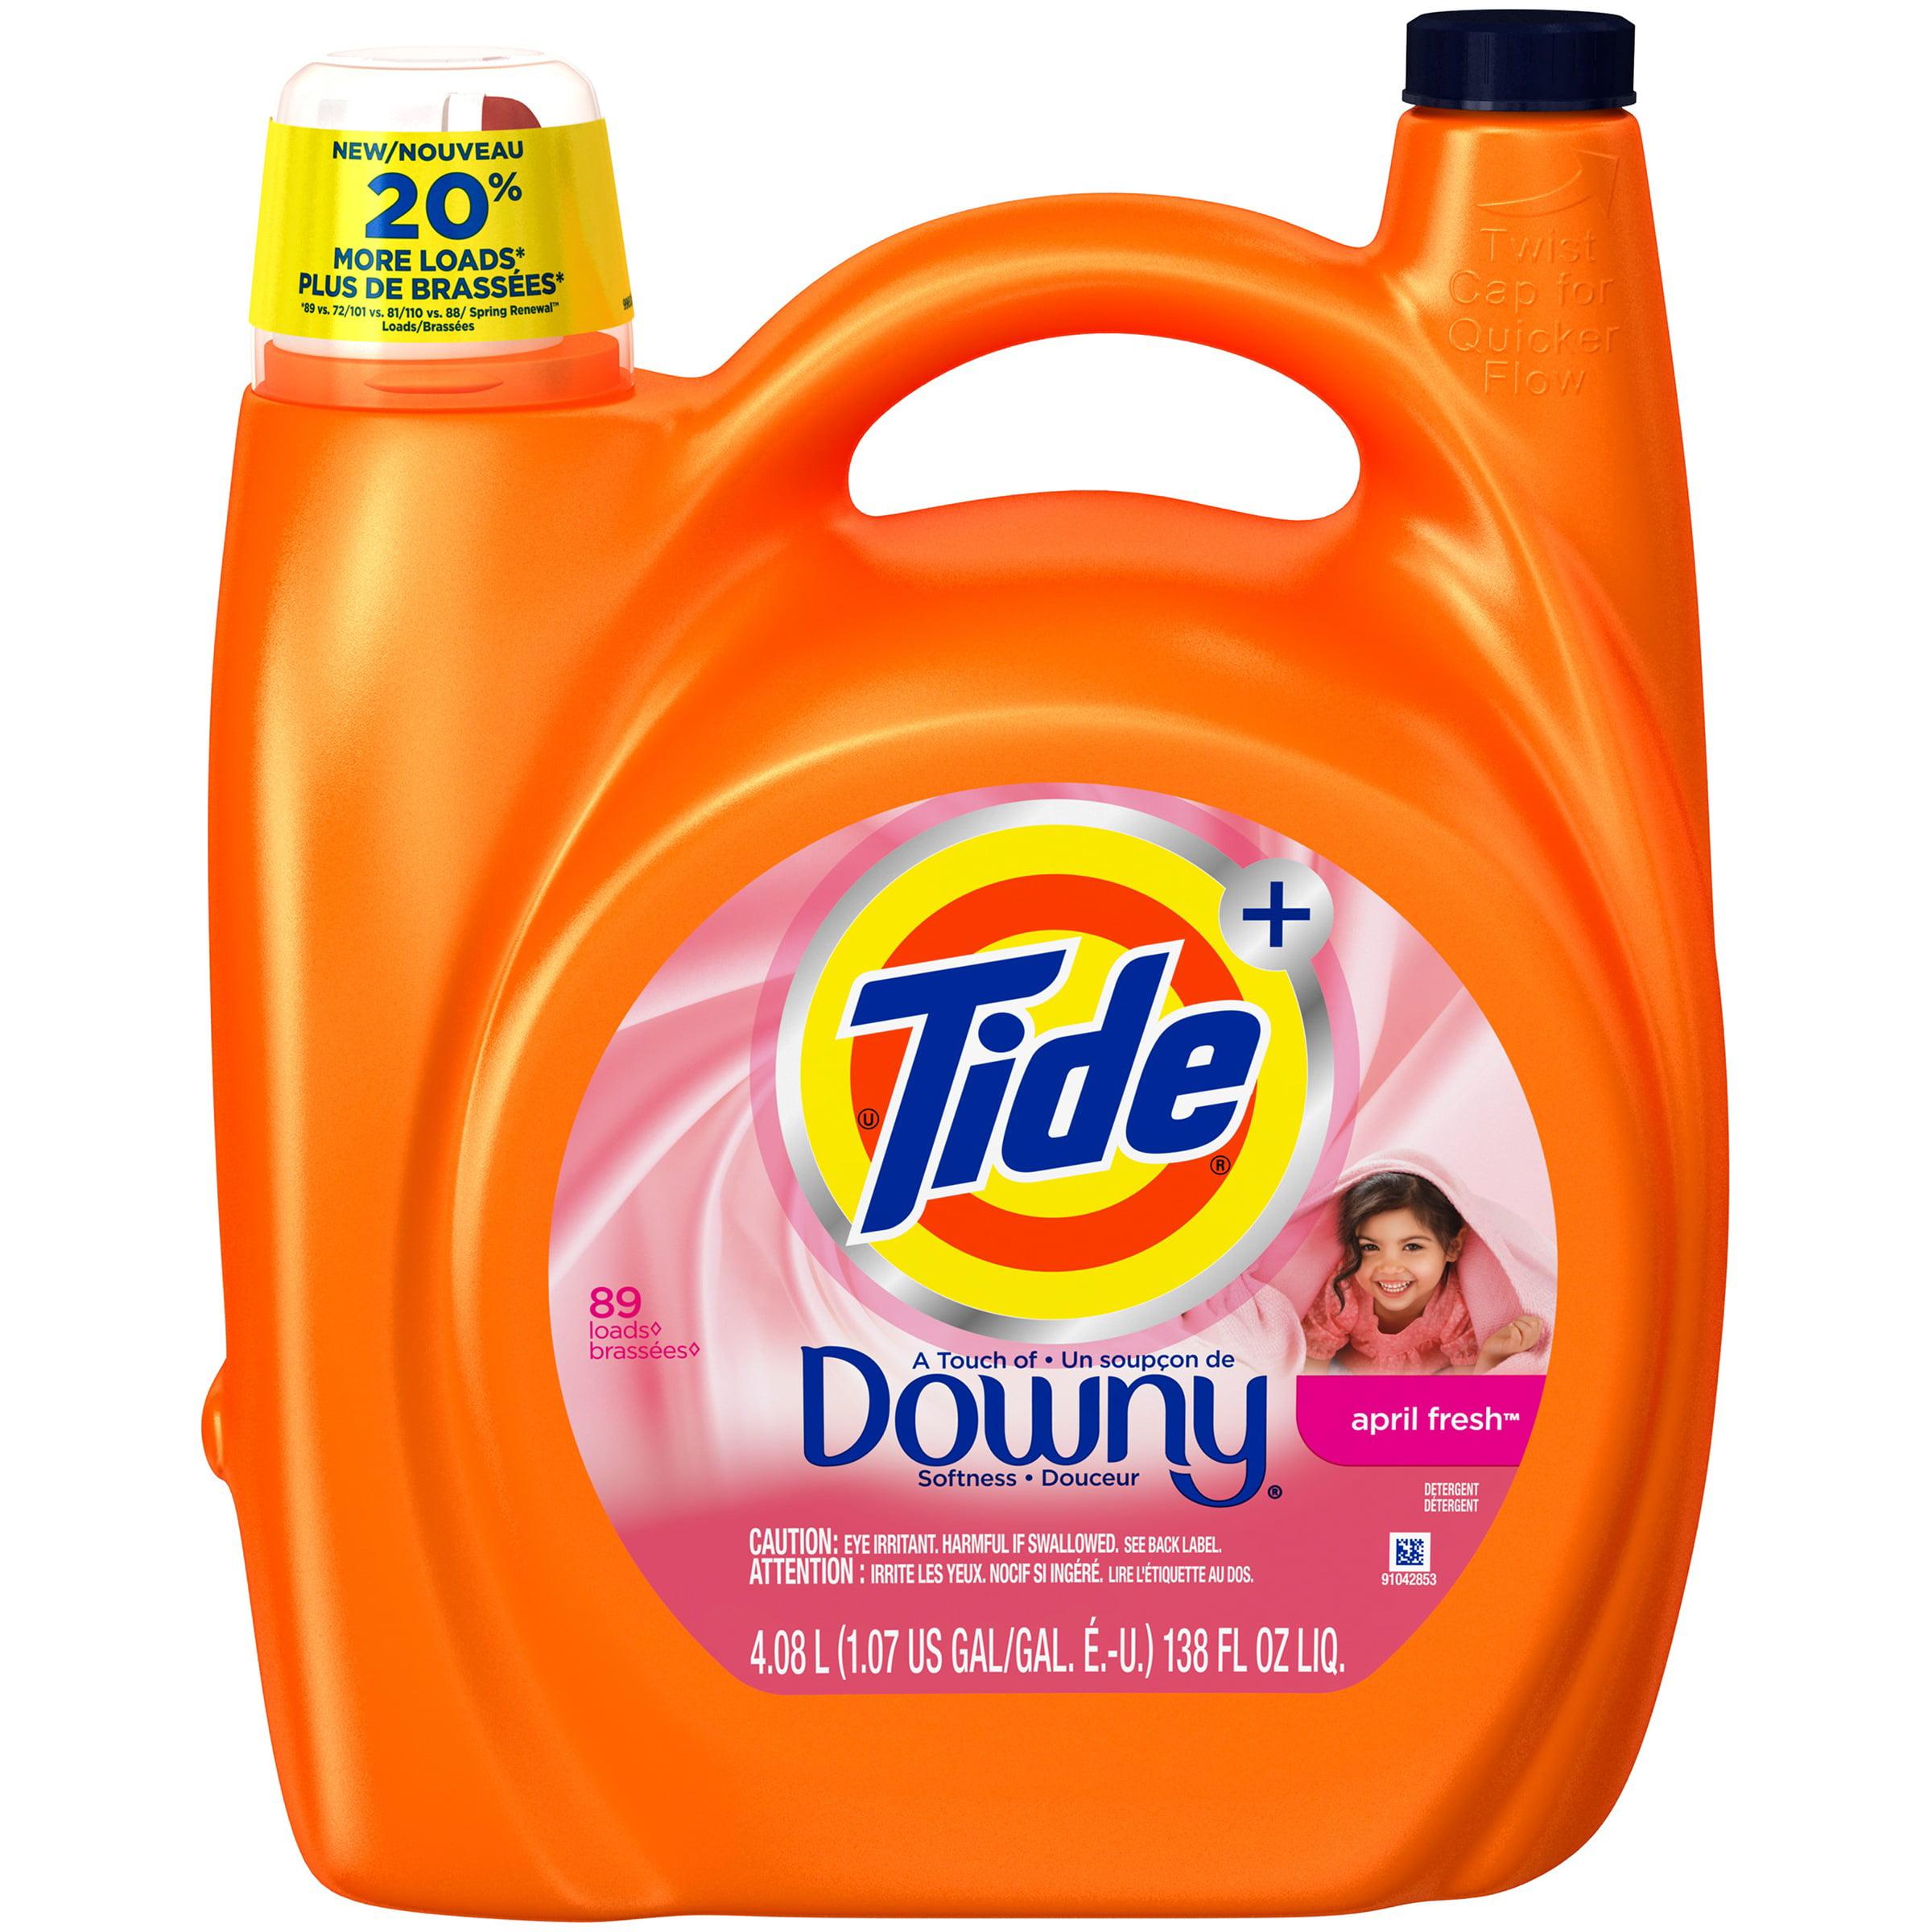 Tide Plus a Touch of Downy April Fresh Liquid Laundry Detergent 138 fl oz